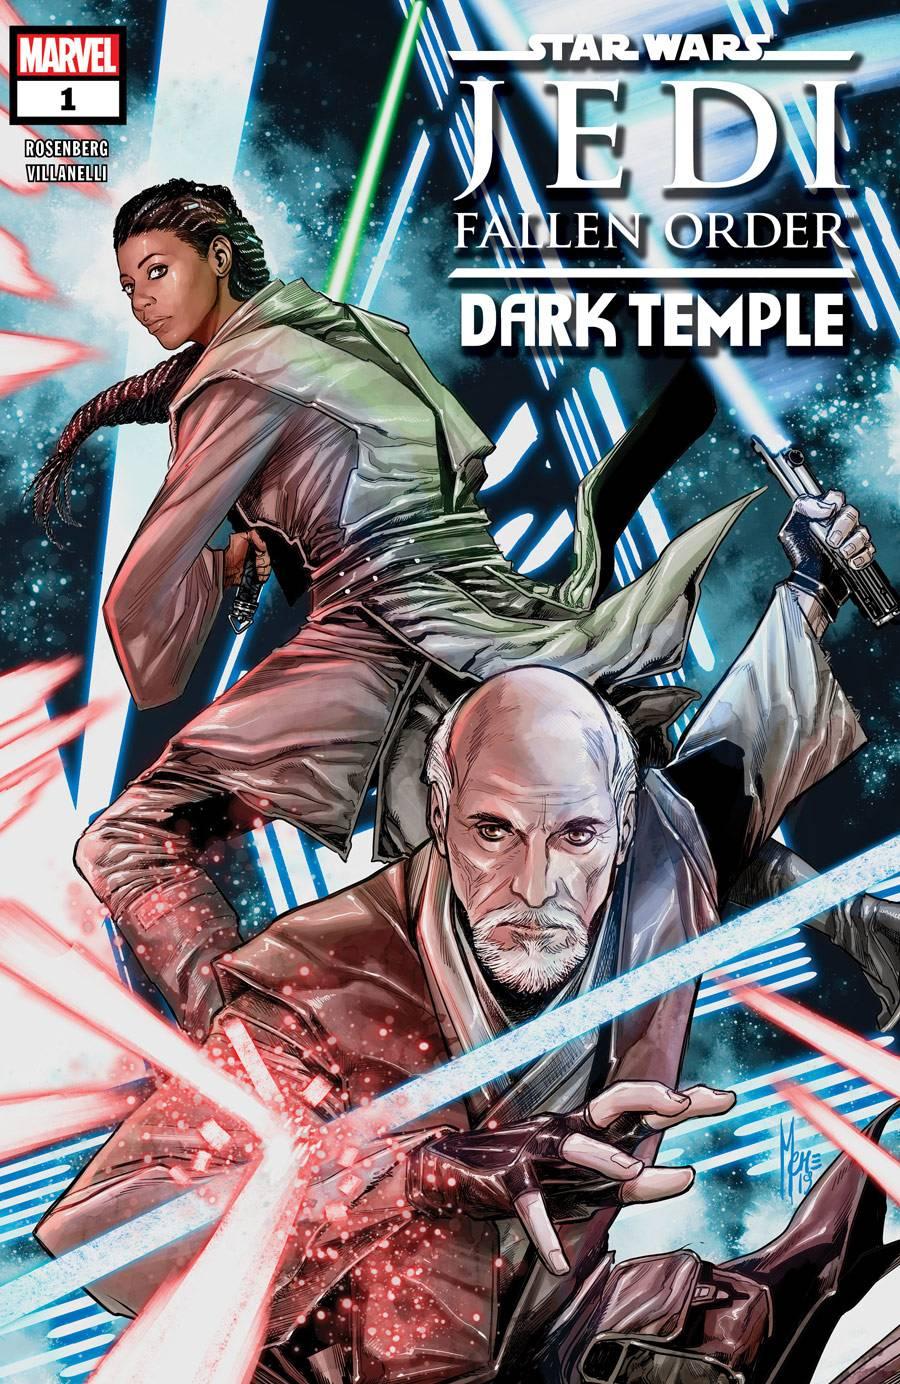 Marvel выпустит комикс-приквел к Star Wars Jedi: Fallen Order